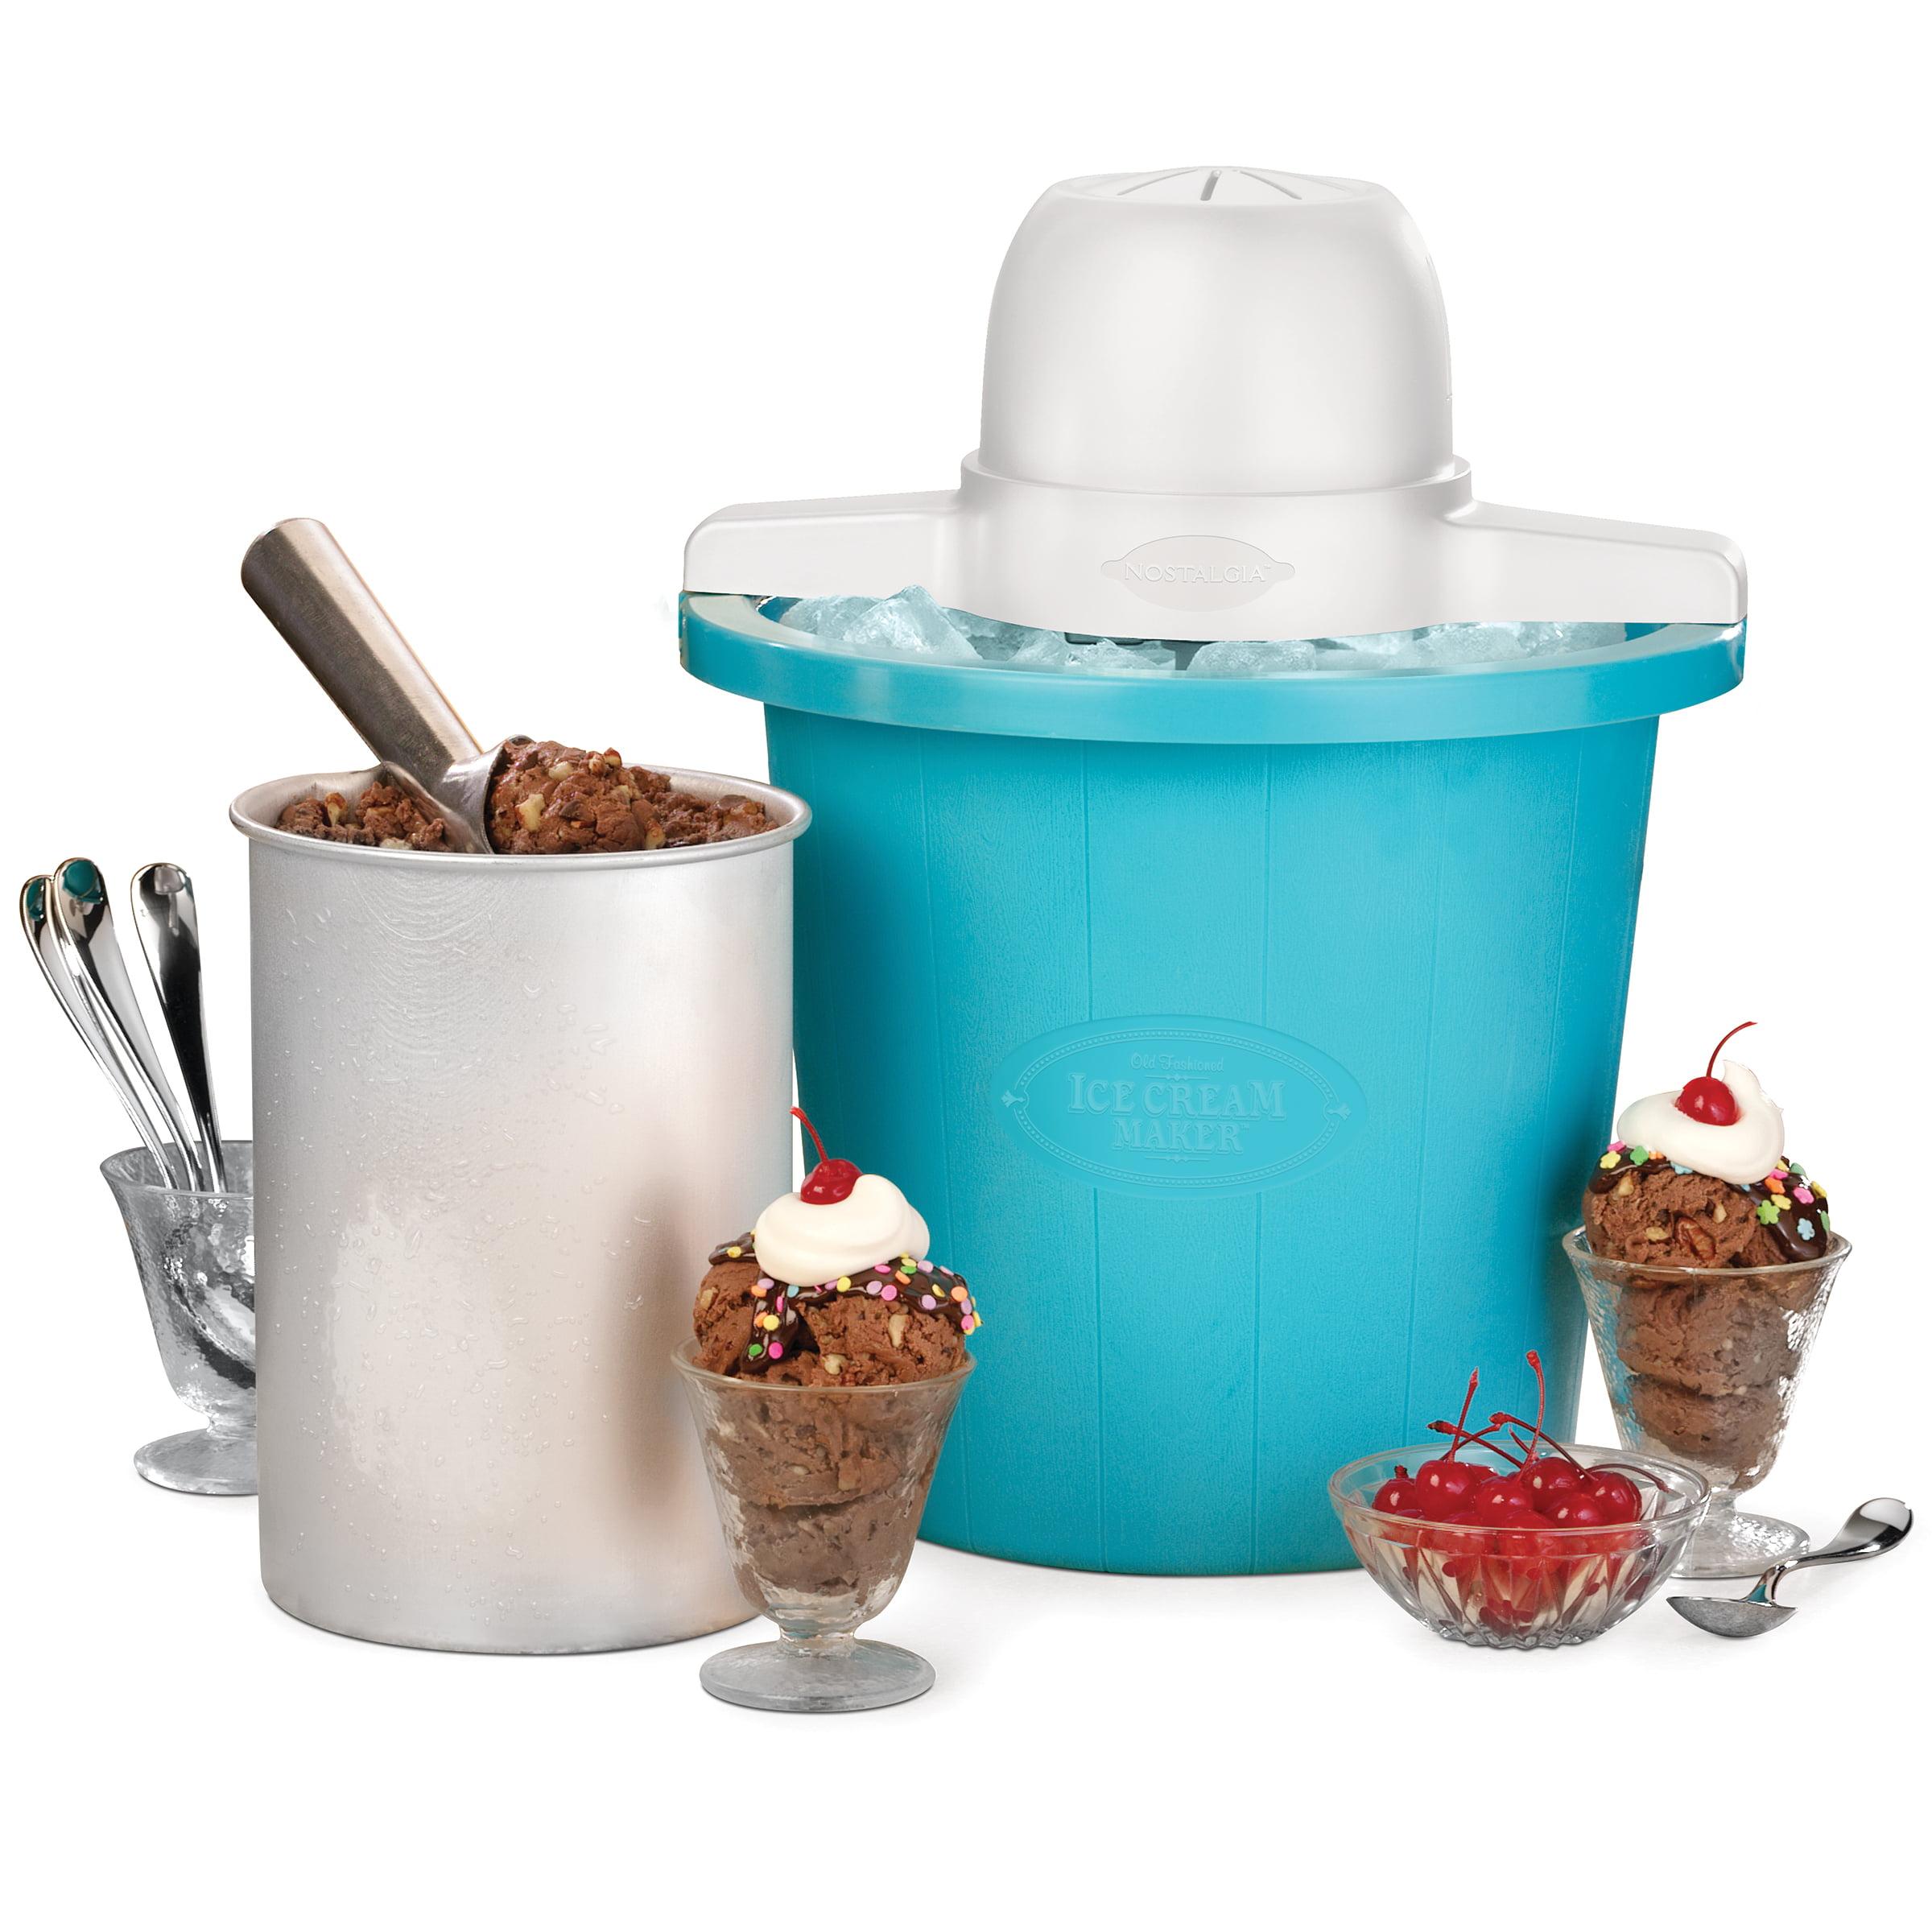 Nostalgia 4-Quart Blue Bucket Electric Ice Cream Maker, ICMP4BL